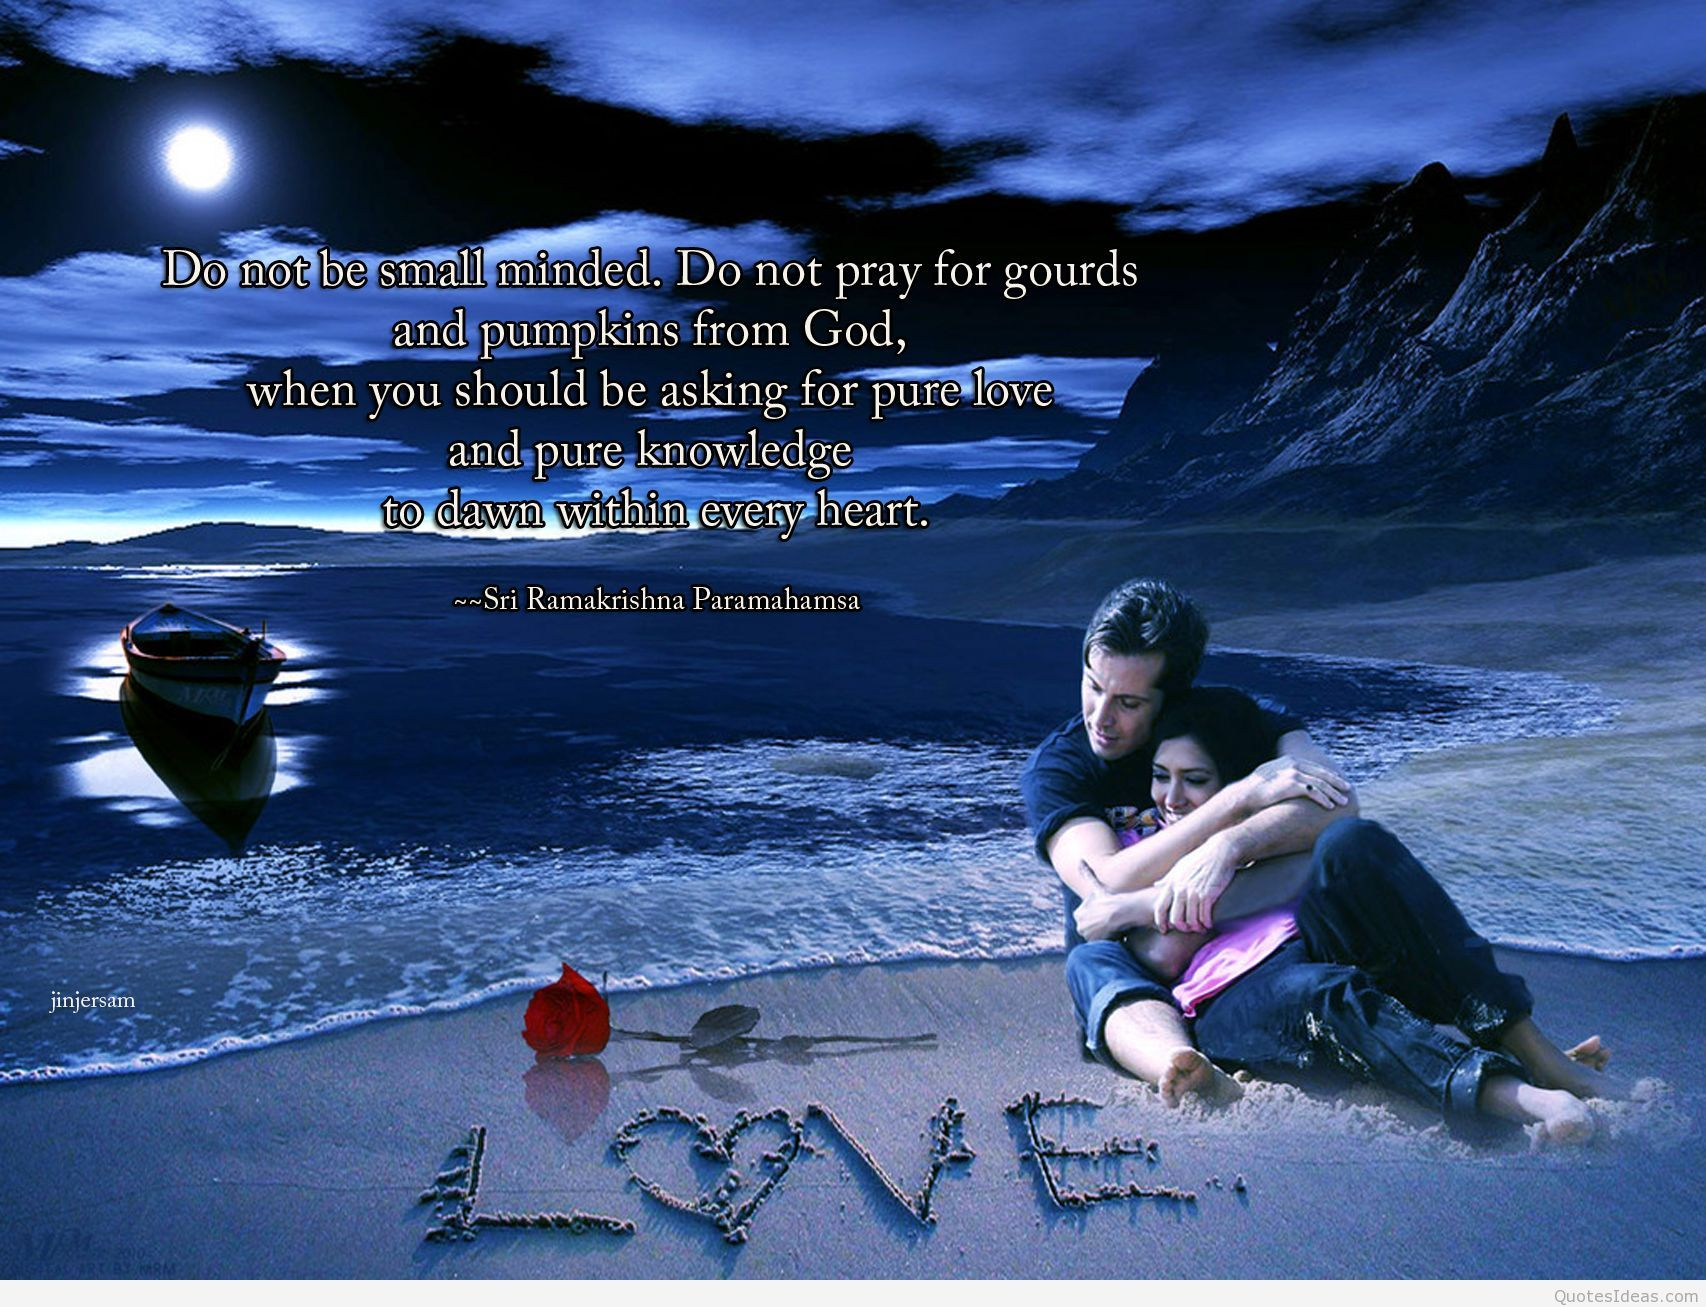 Wallpaper download in love - Sad Love Wallpapers And Pictures 1706 1307 Sad Picture Wallpapers 65 Wallpapers